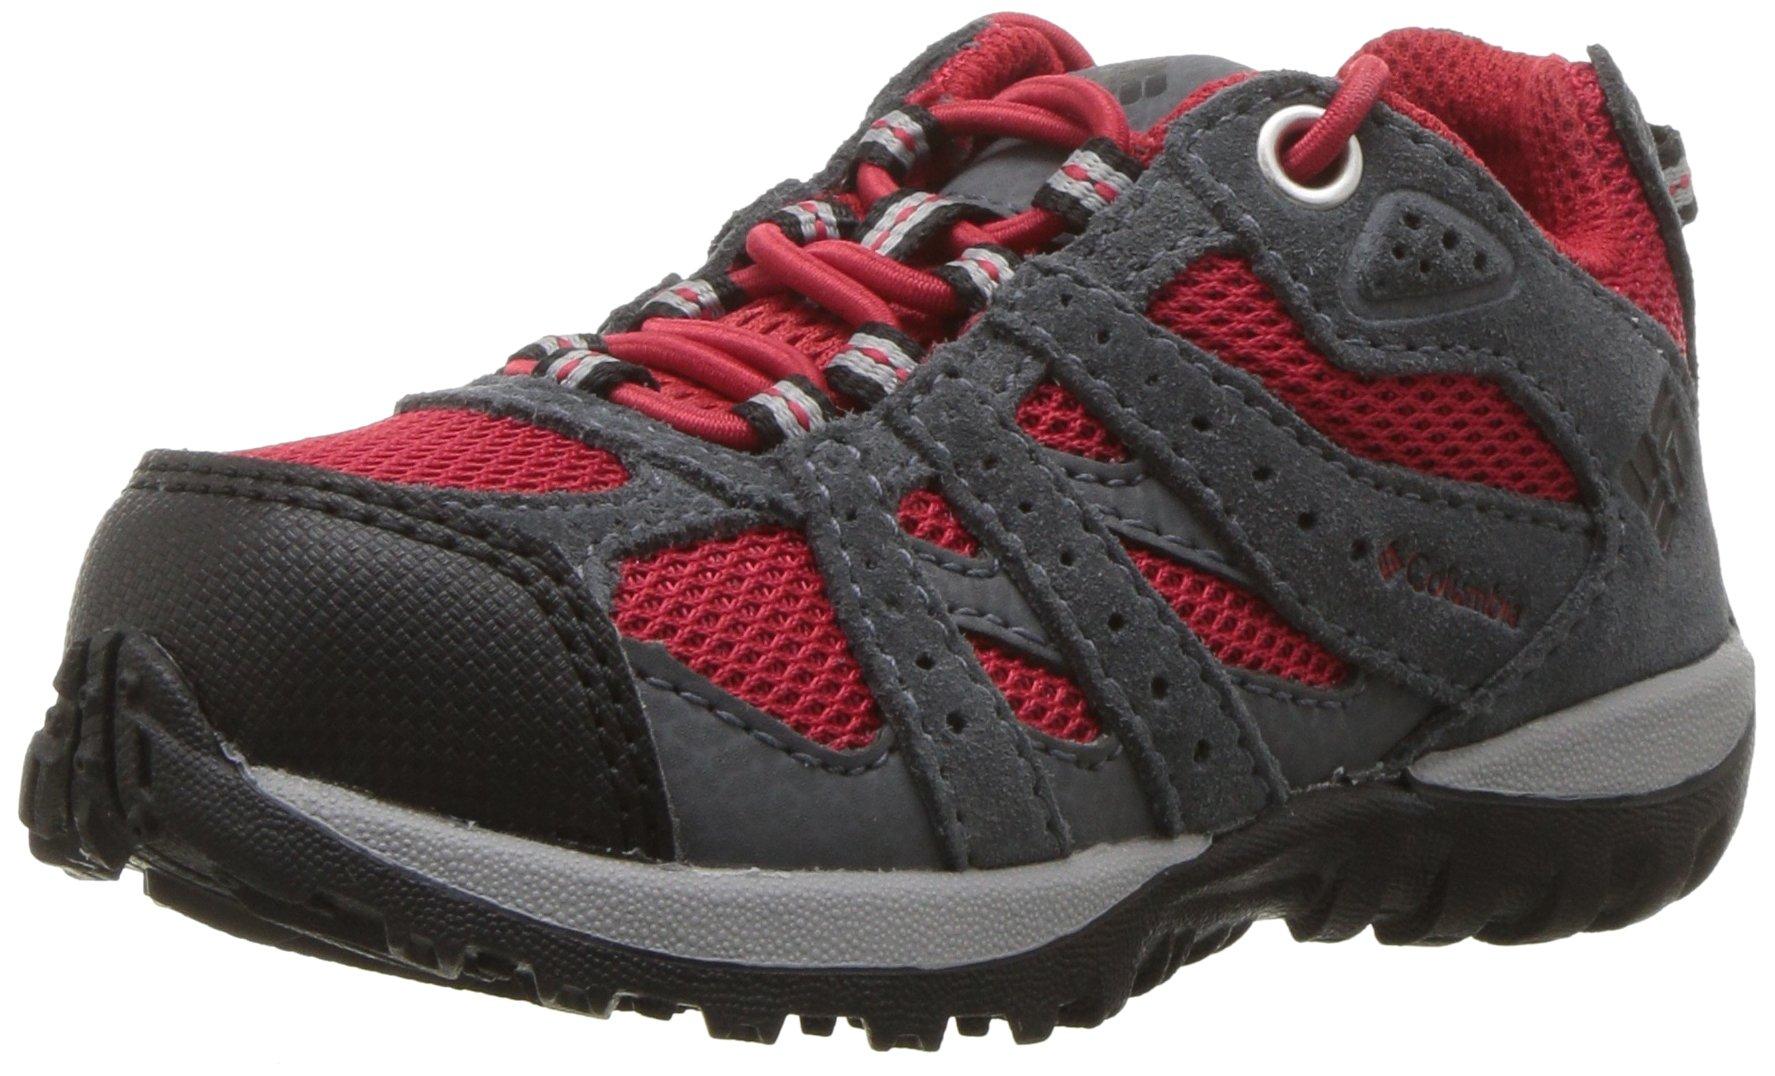 Columbia Unisex Childrens Redmond Waterproof Hiking Shoe, Mountain red, Black, 11 Regular US Little Kid